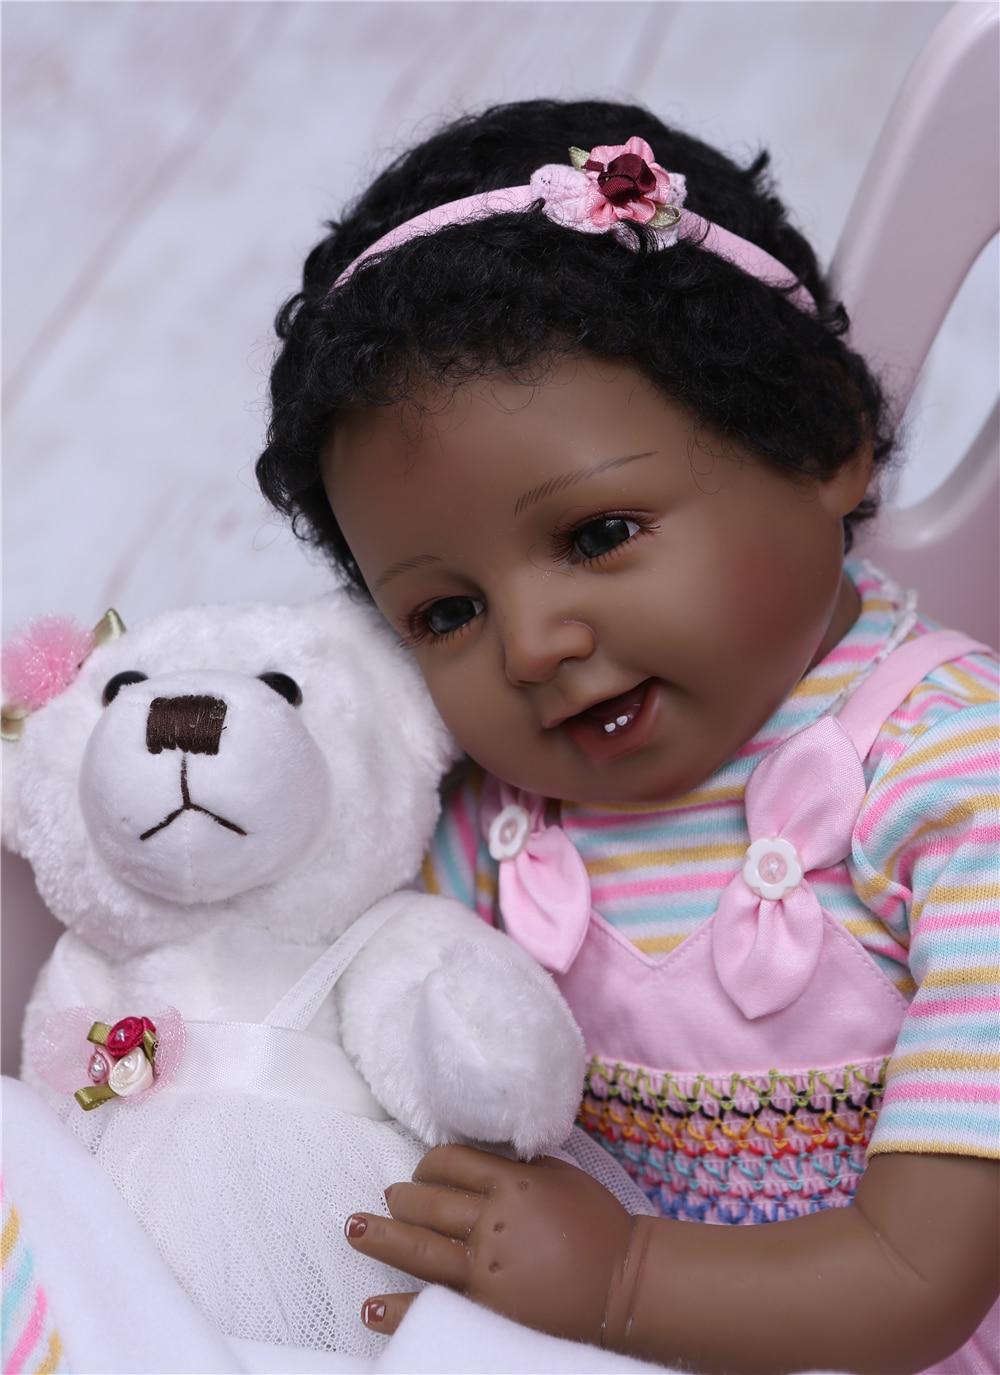 "Black doll reborn NPK 22""55cm soft silicone reborn baby dolls cotton body newborn girl Bebe alive doll with bear plush"